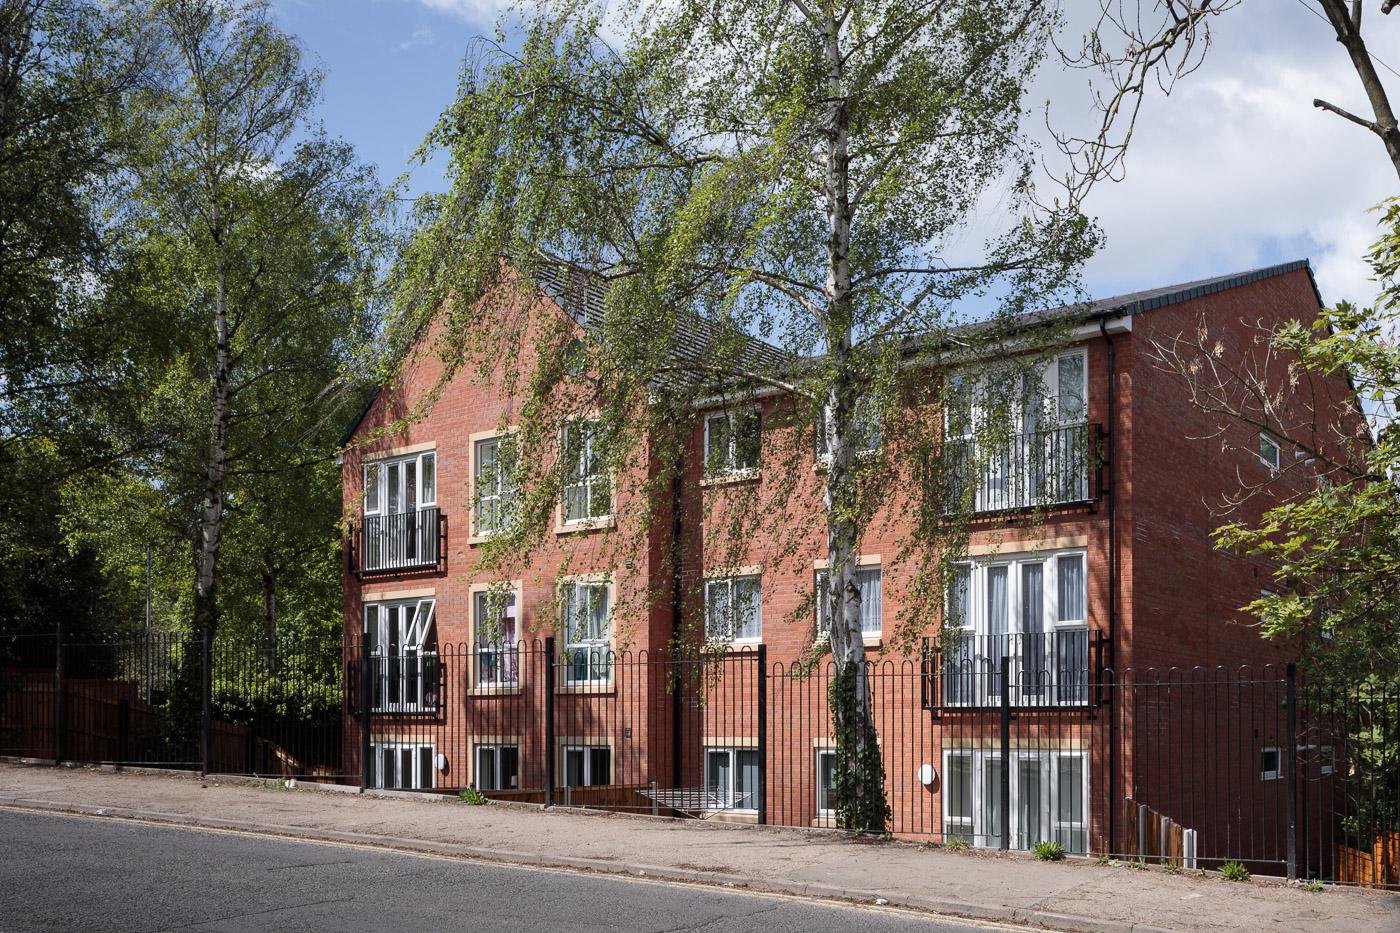 Birch_View,_Mill_Hill_Lane,_Derby.jpg